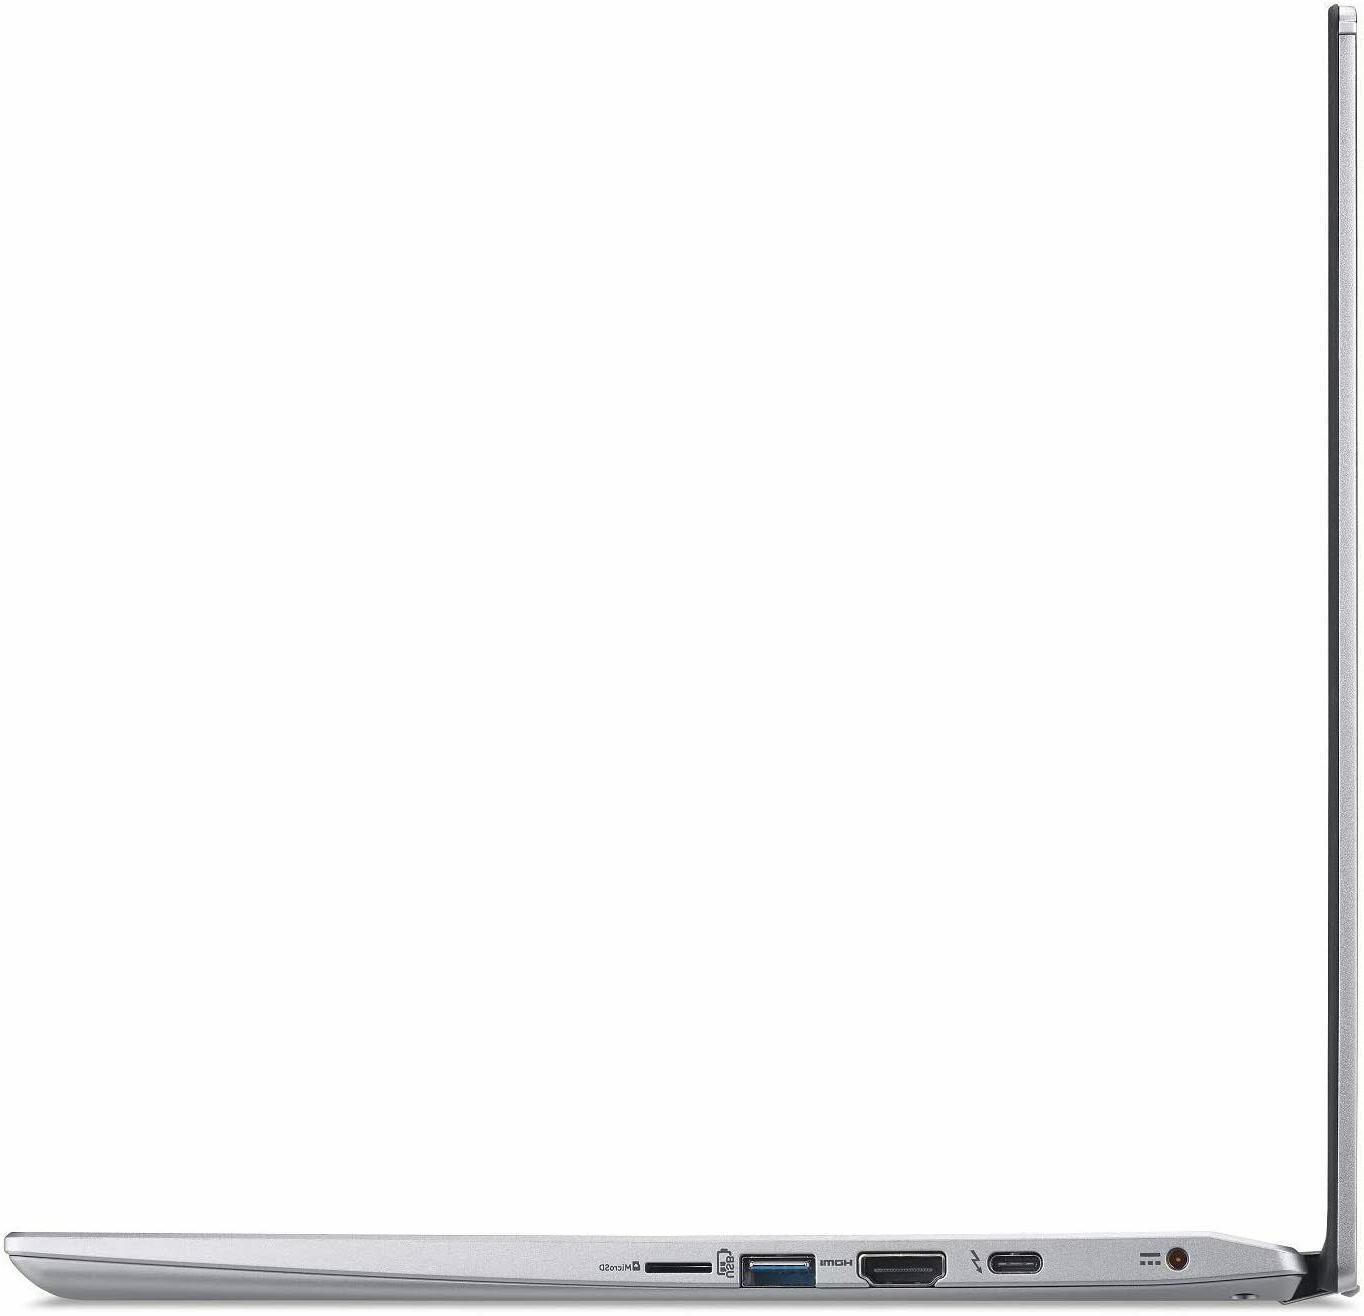 Acer 3 FHD Touchscreen Laptop 8GB 512GB Active Stylus Pen